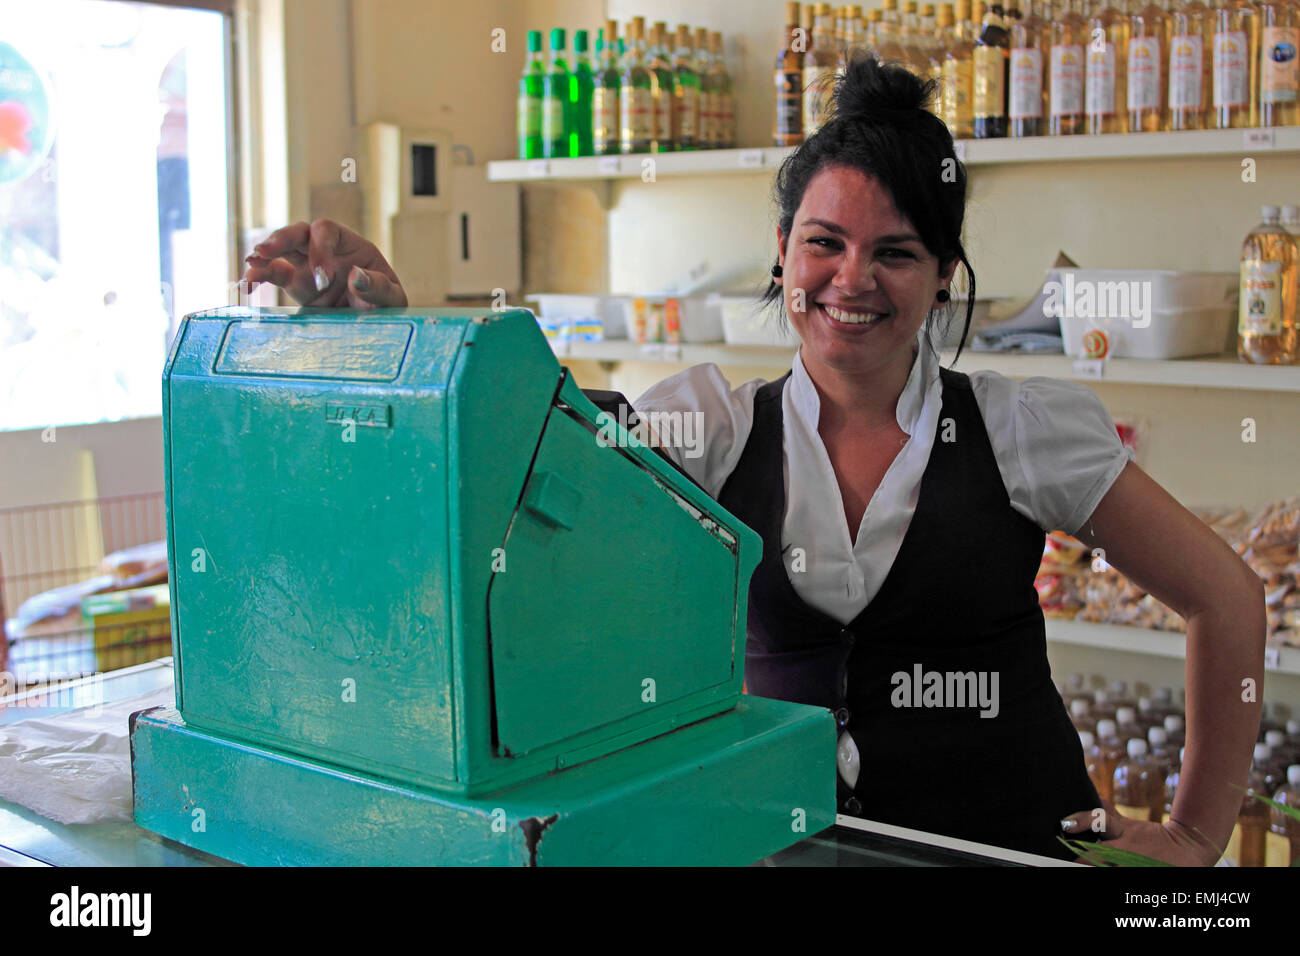 Straßenbild junge Frau Kassierer im Statusspeicher Cienfuegos Kuba Stockfoto